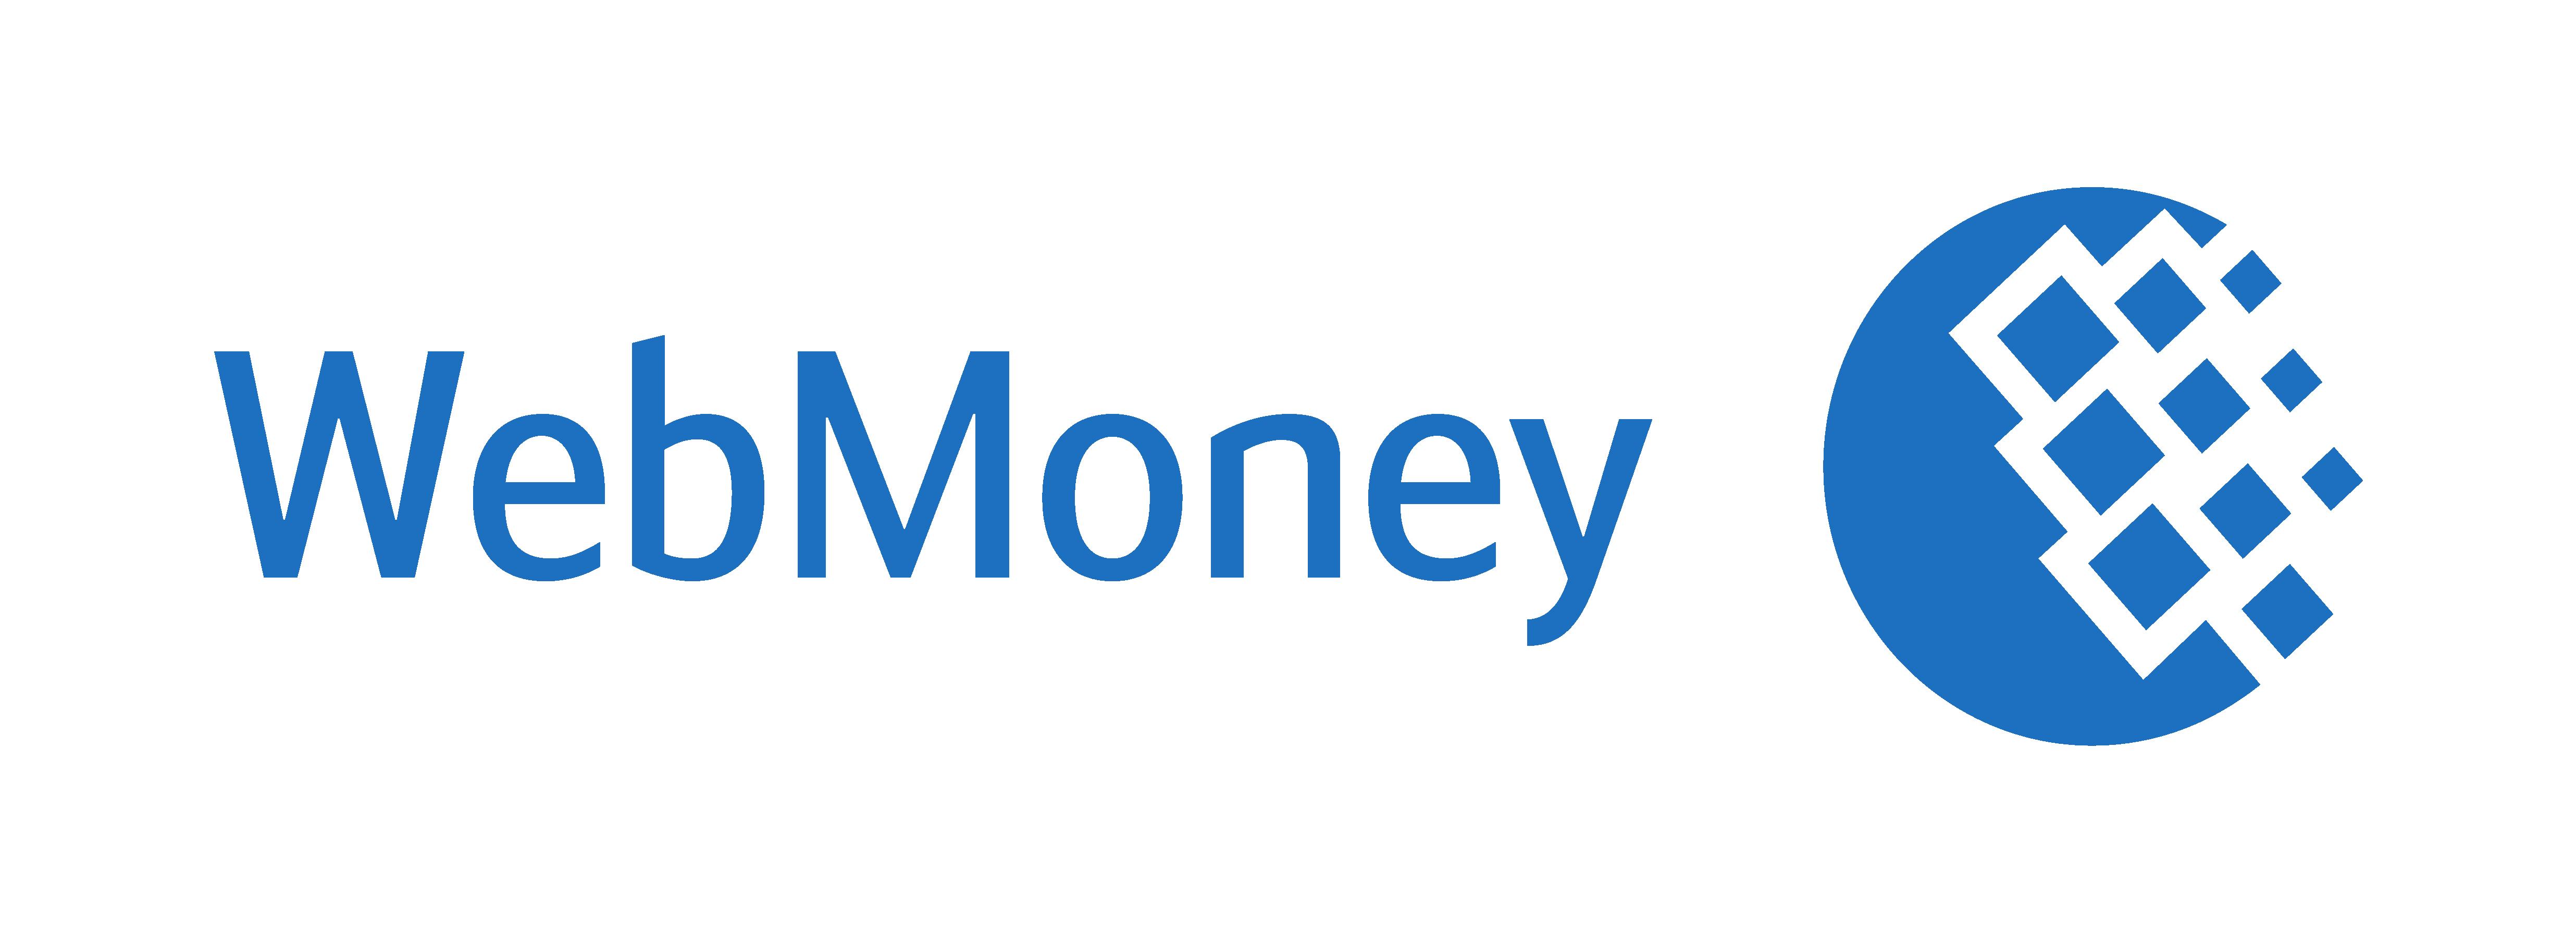 Amana Payment Options - WebMoney